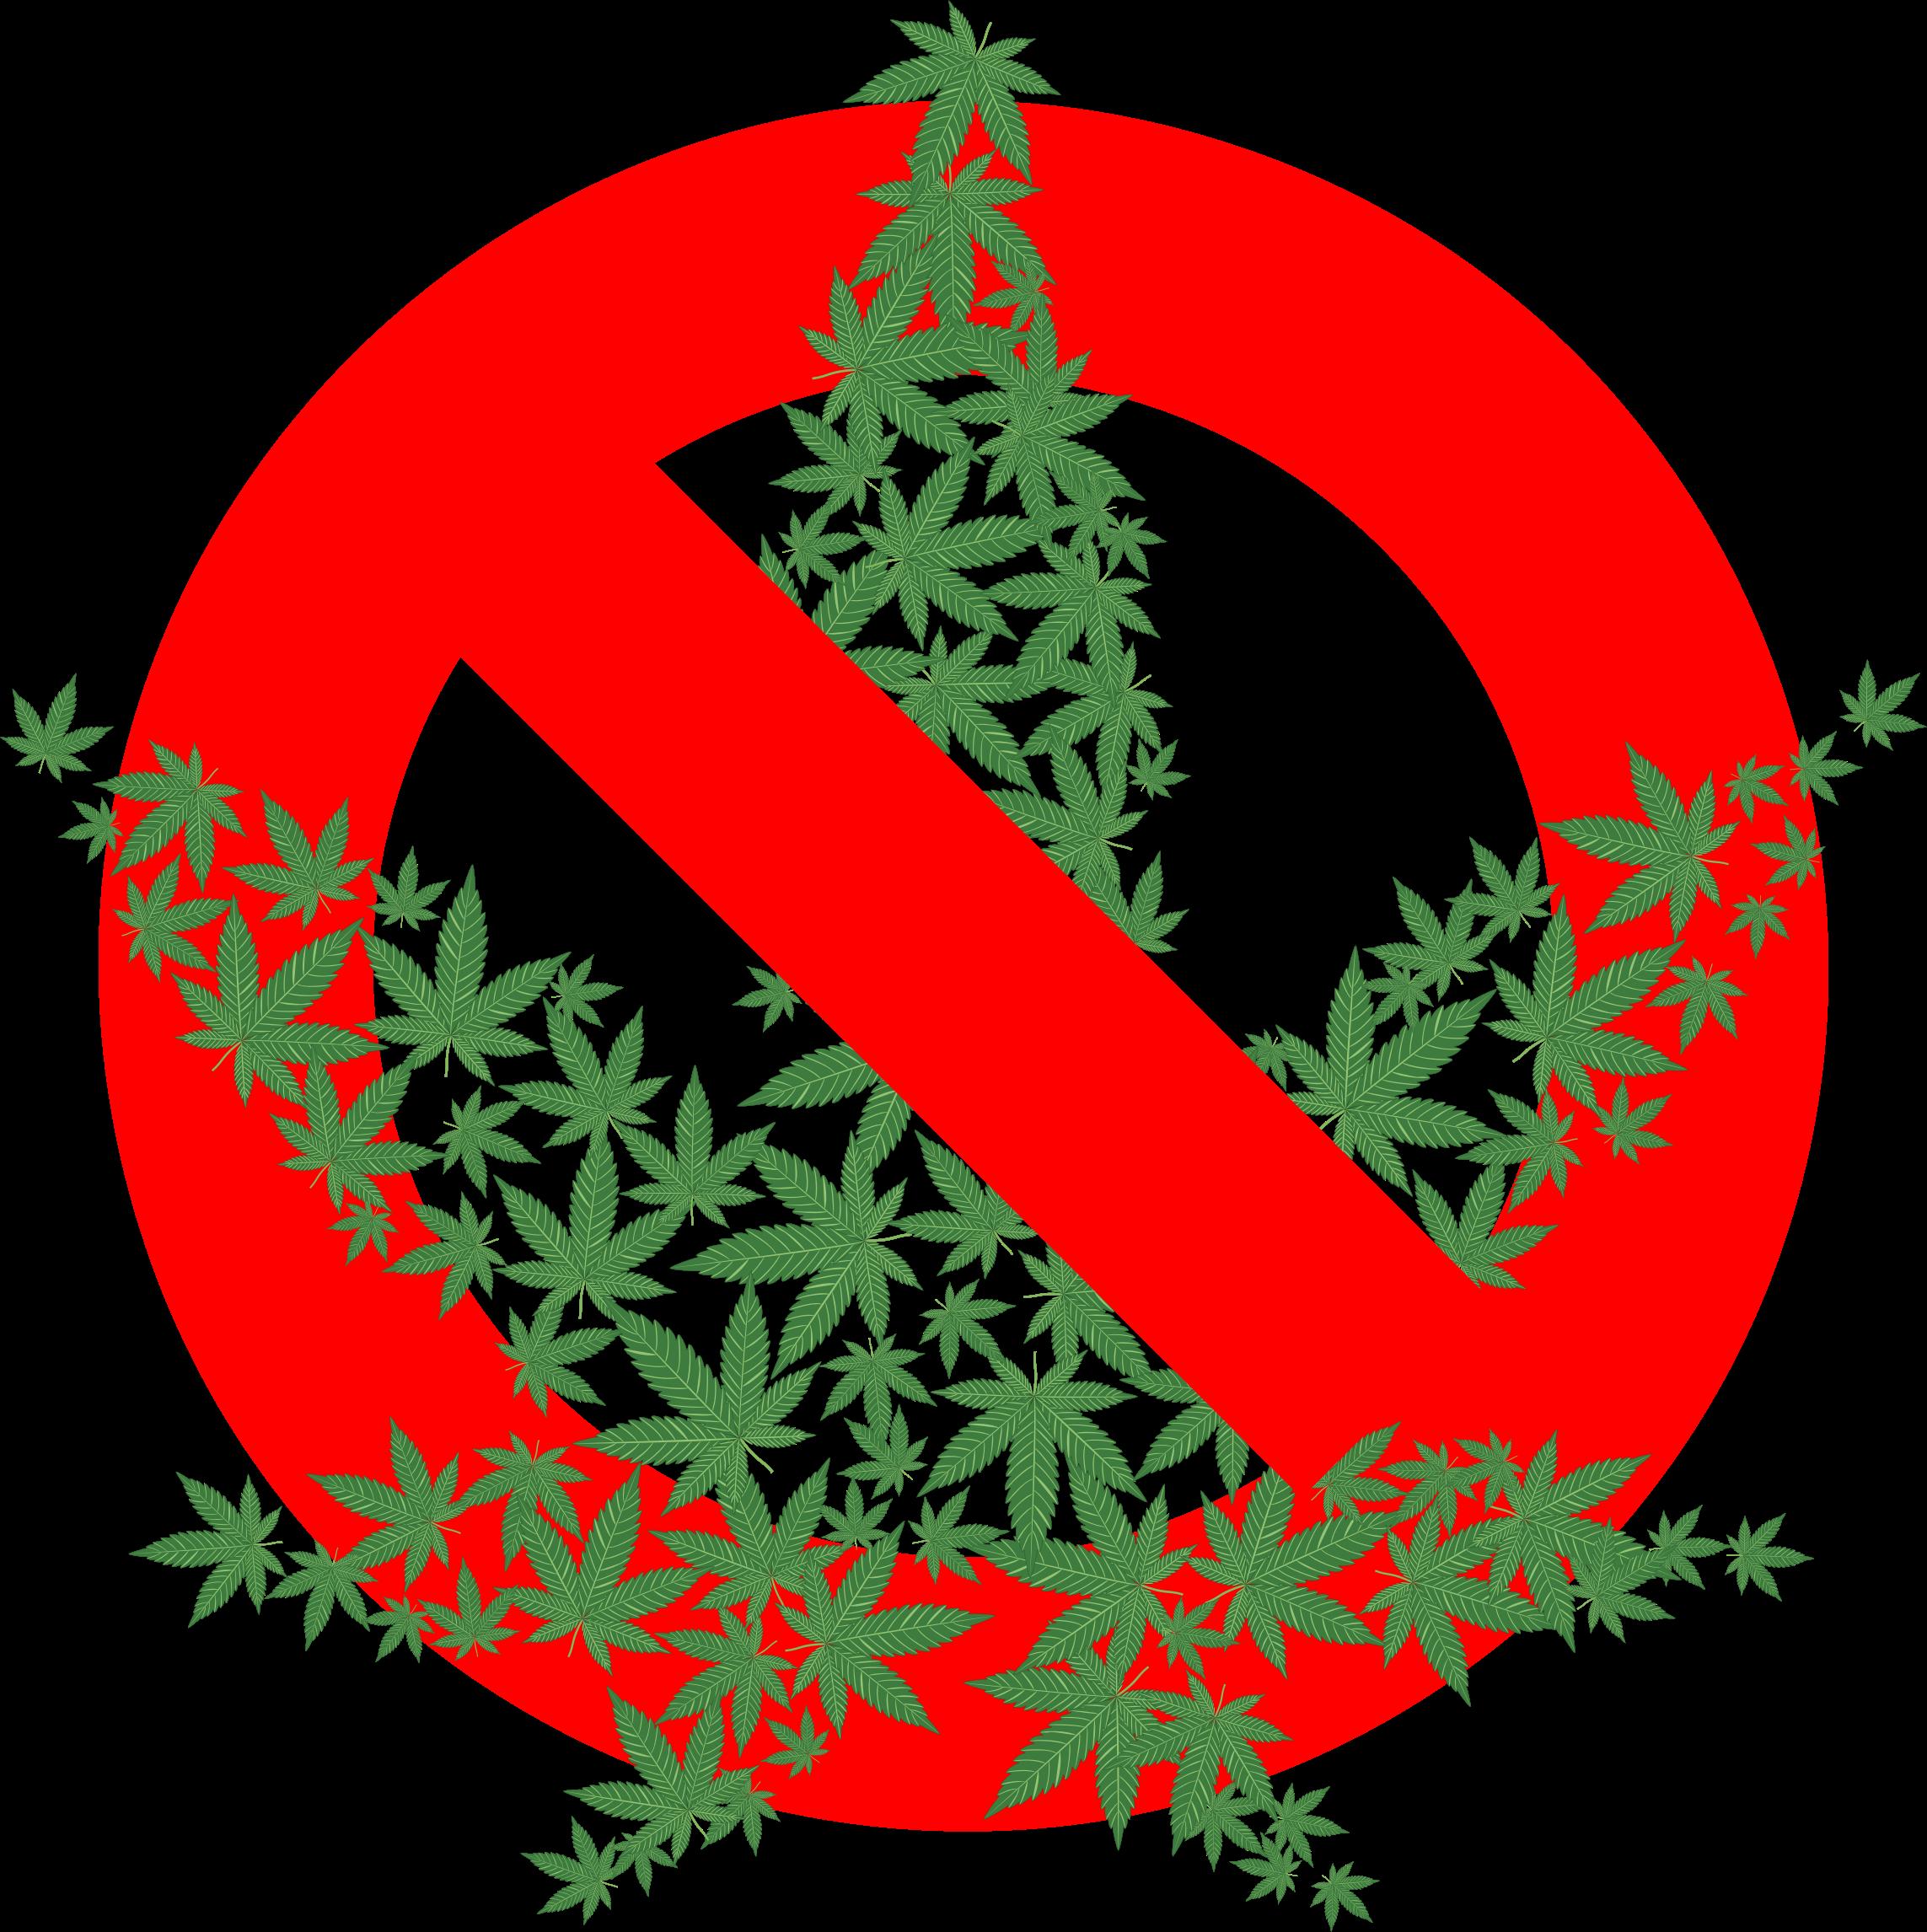 Marijuana clipart illegal. Fractal prohibited big image